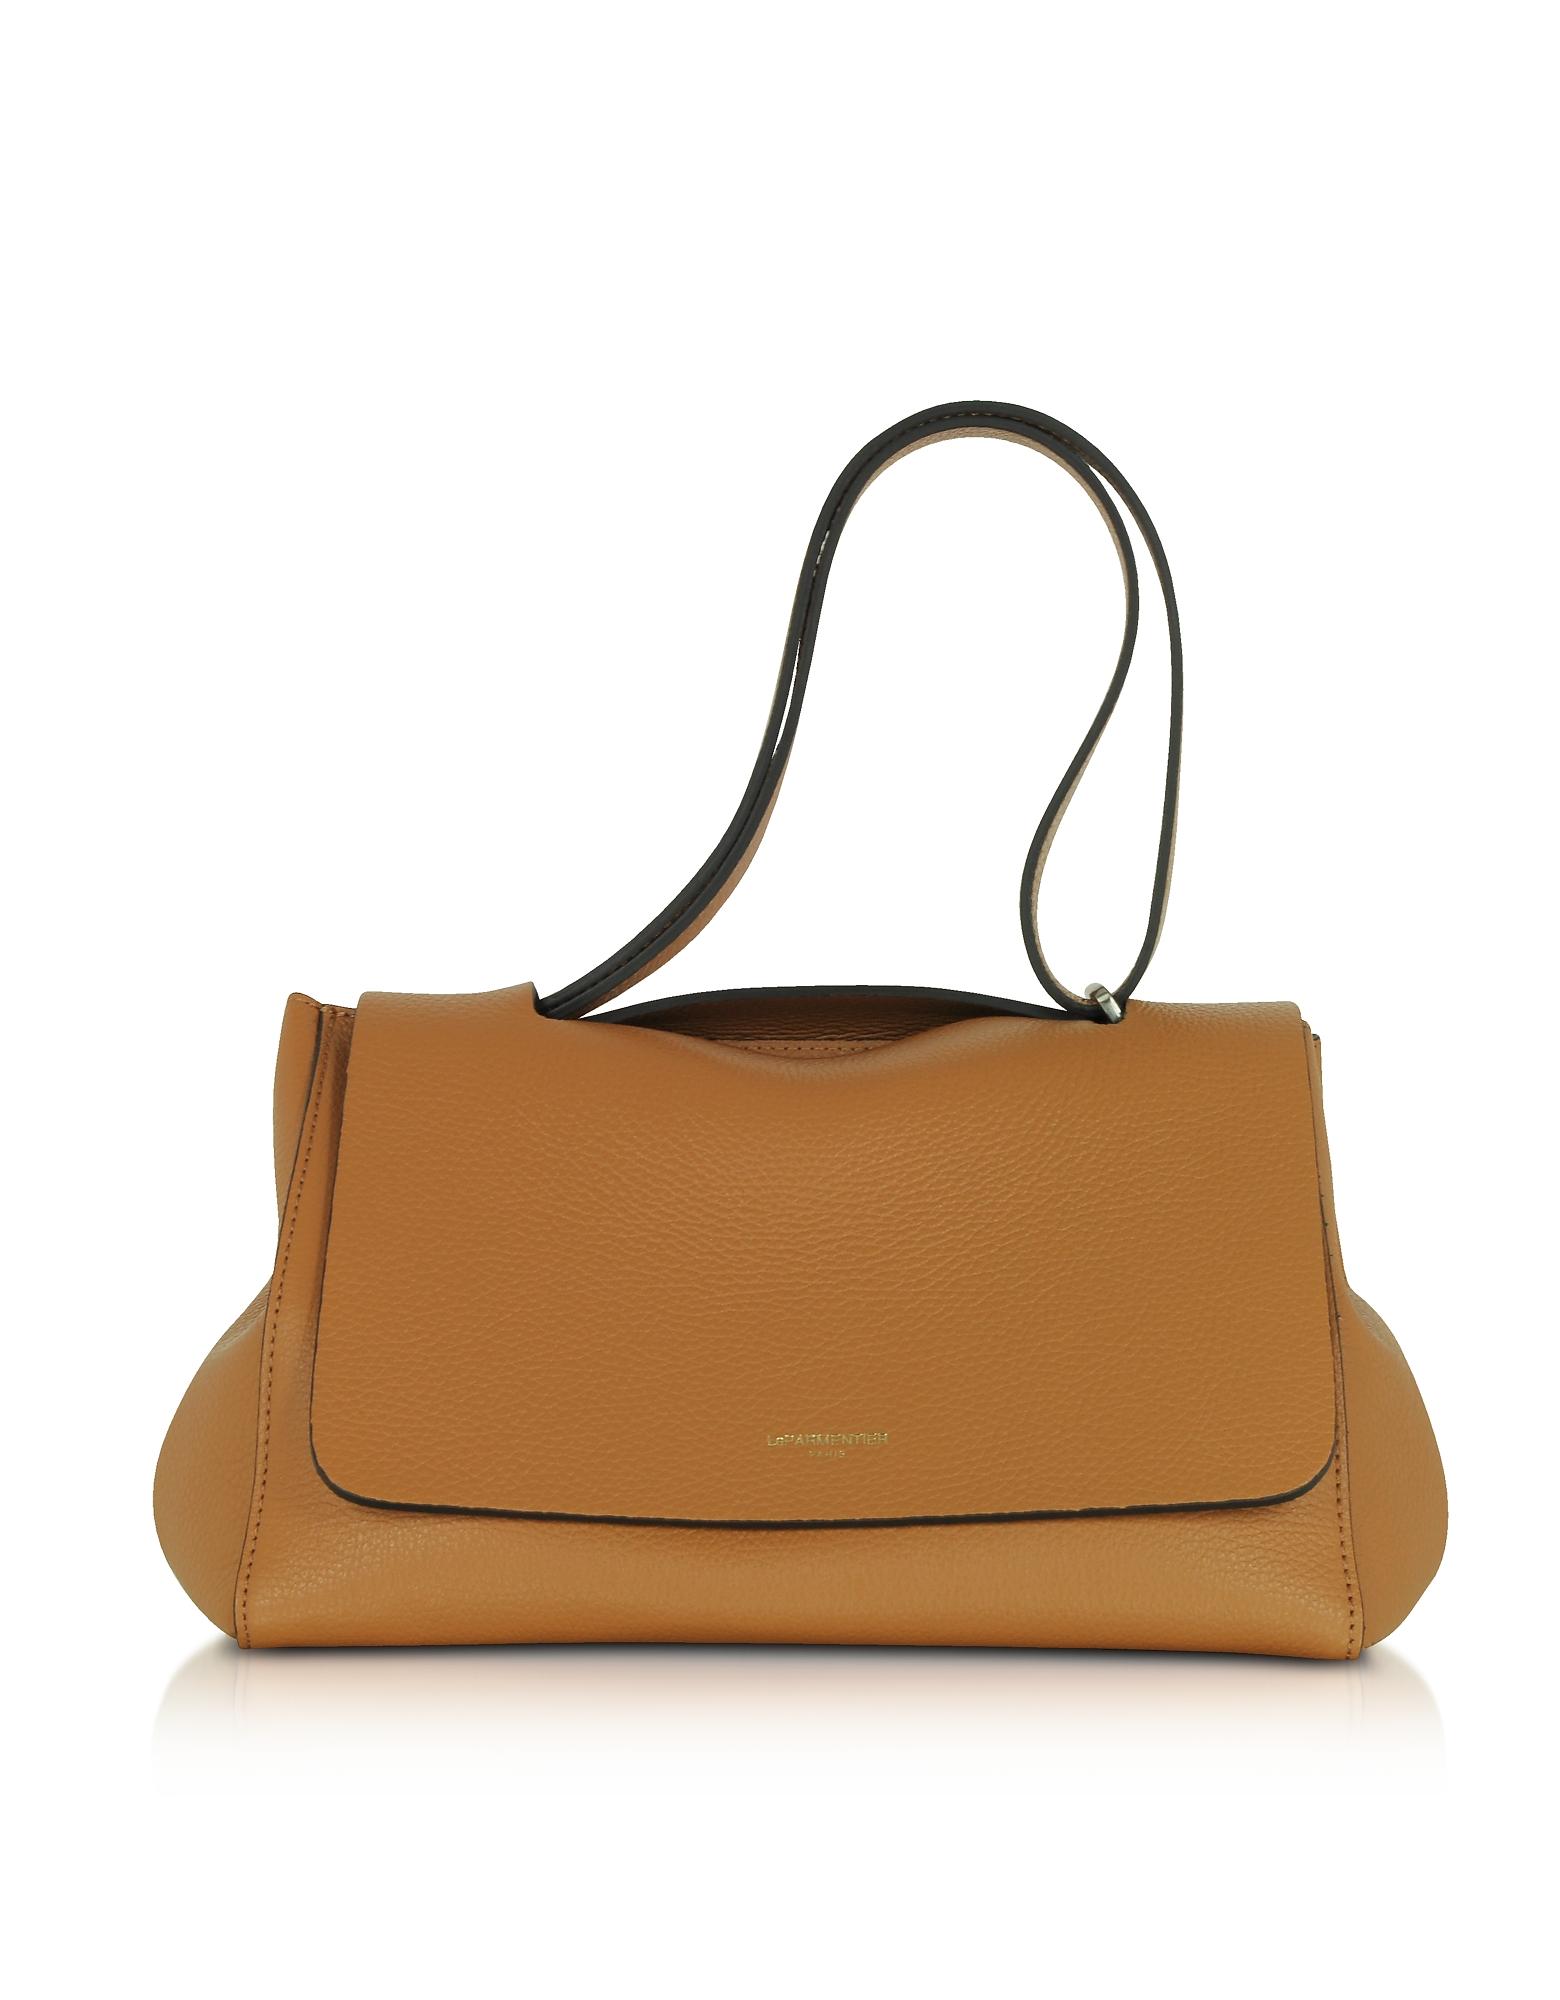 Le Parmentier Handbags, Ciprea Hammered Leather Satchel Bag